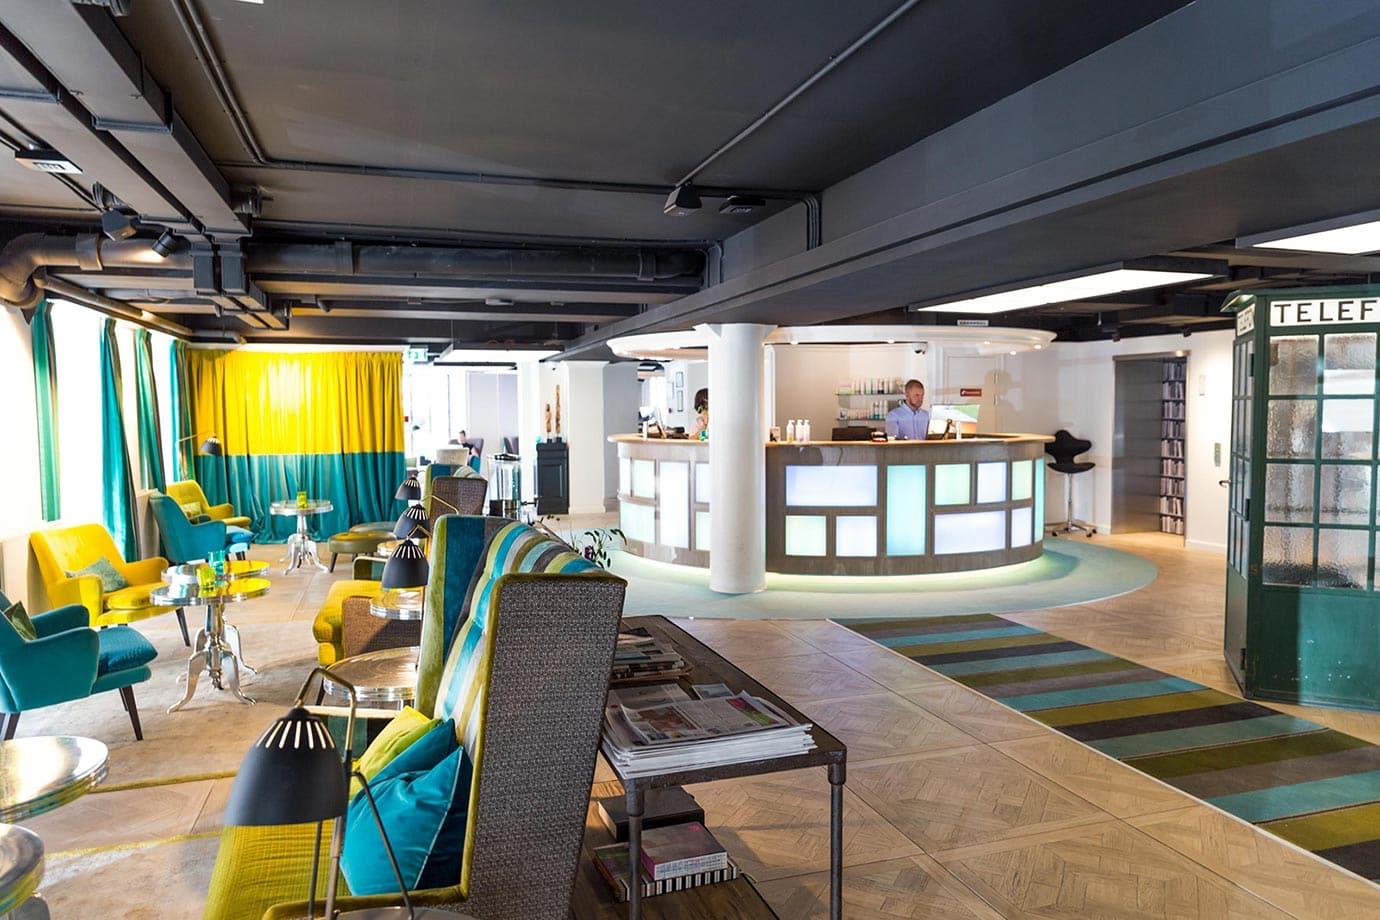 Reception area of the Absalon Hotel, Copenhagen